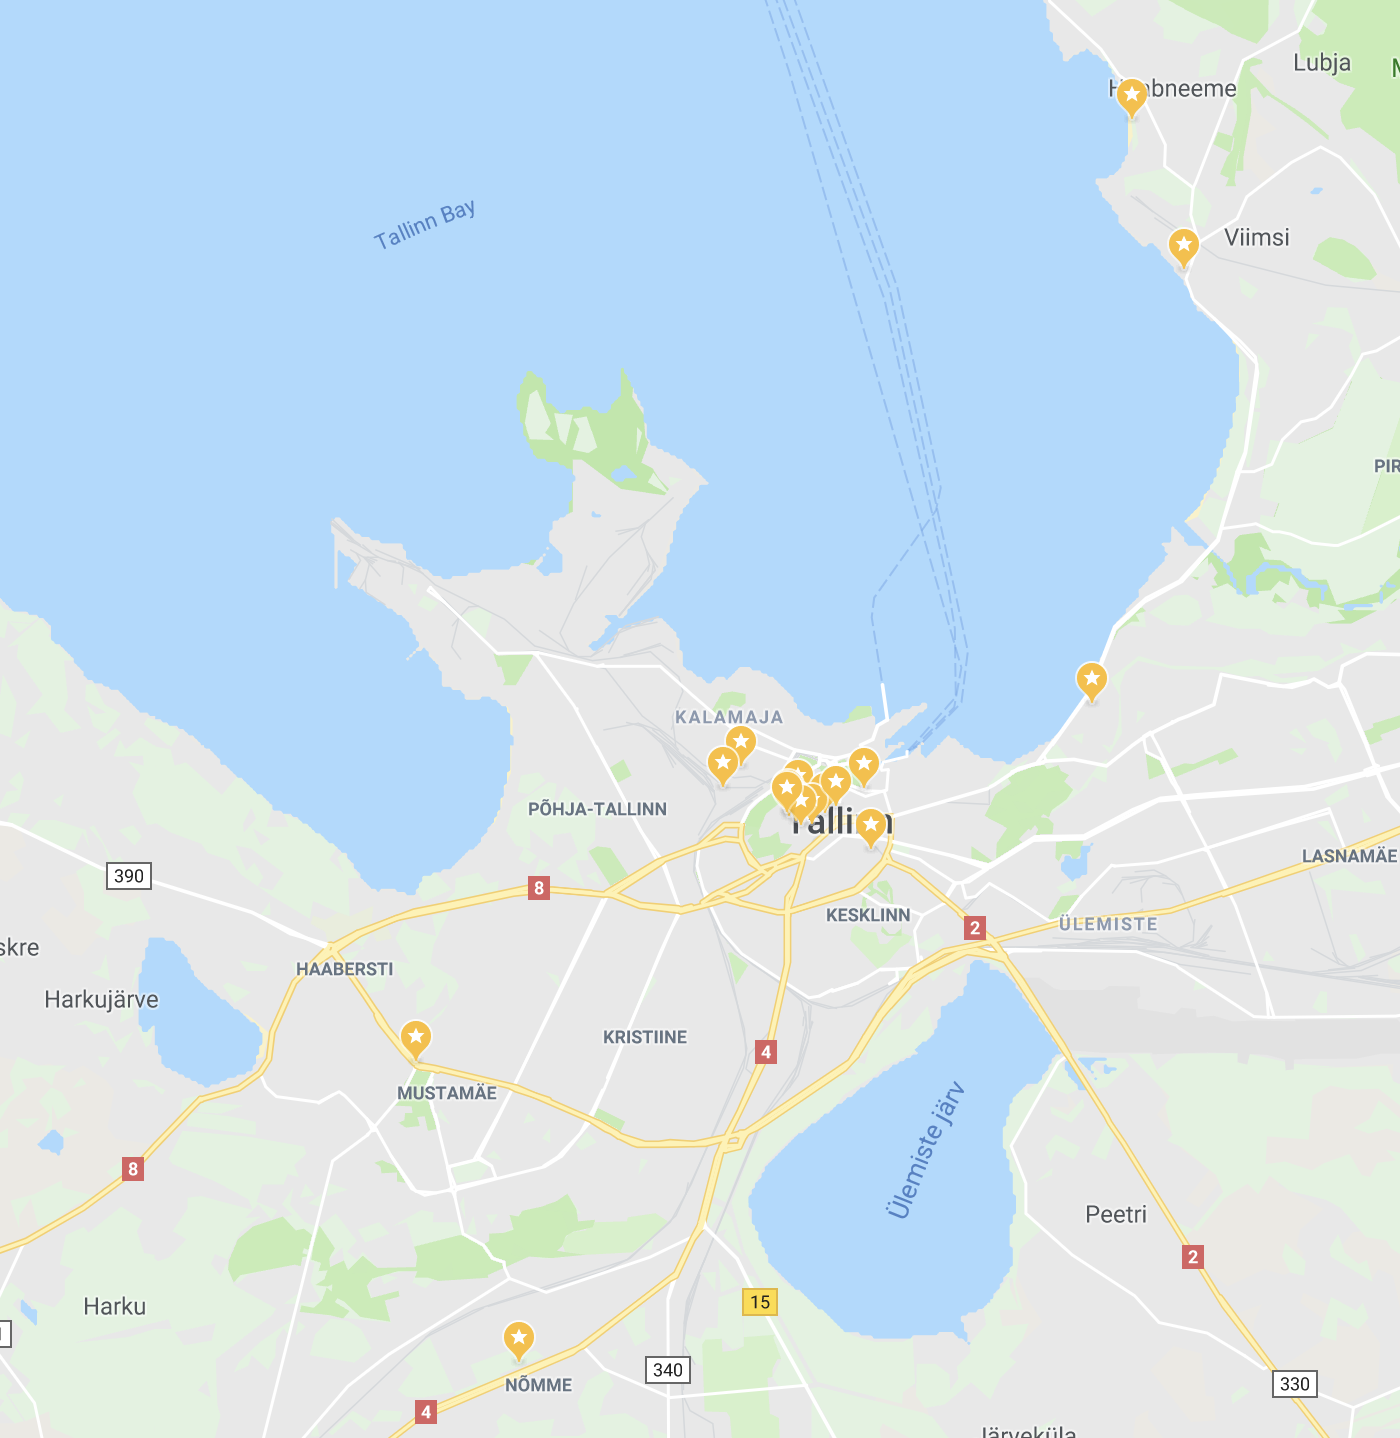 Foodie hotspots in Tallinn map, tallinn restaurants, things to do in tallinn, estonia restaurants